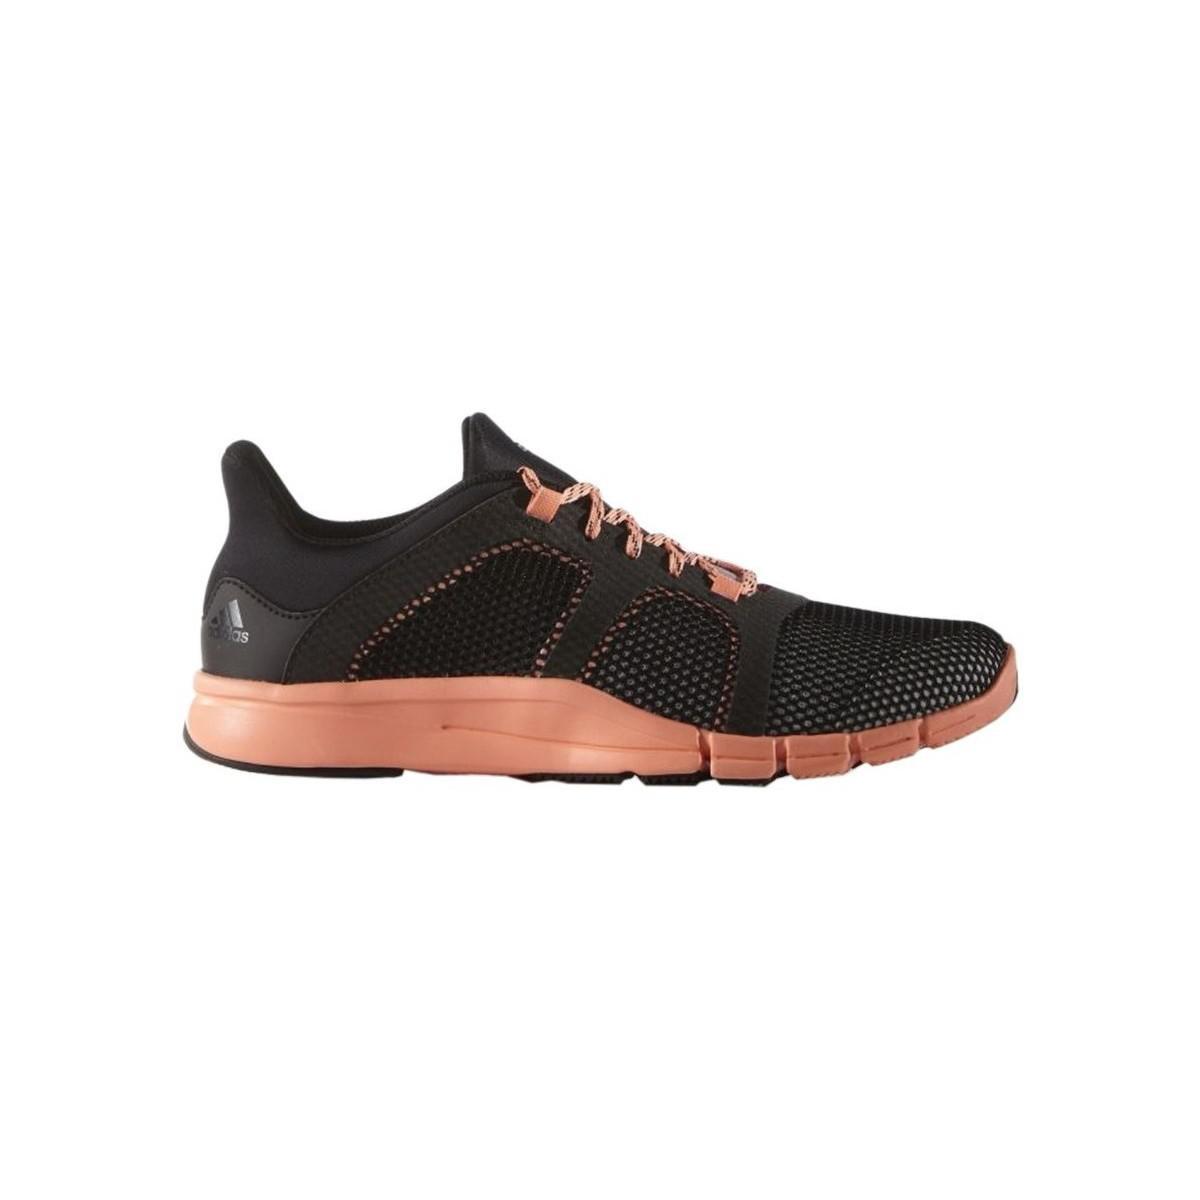 Adidas Da Adipure Flex W Scarpe Da Adidas Donna (Formatori) In Marrone In Marrone Lyst f5adcb